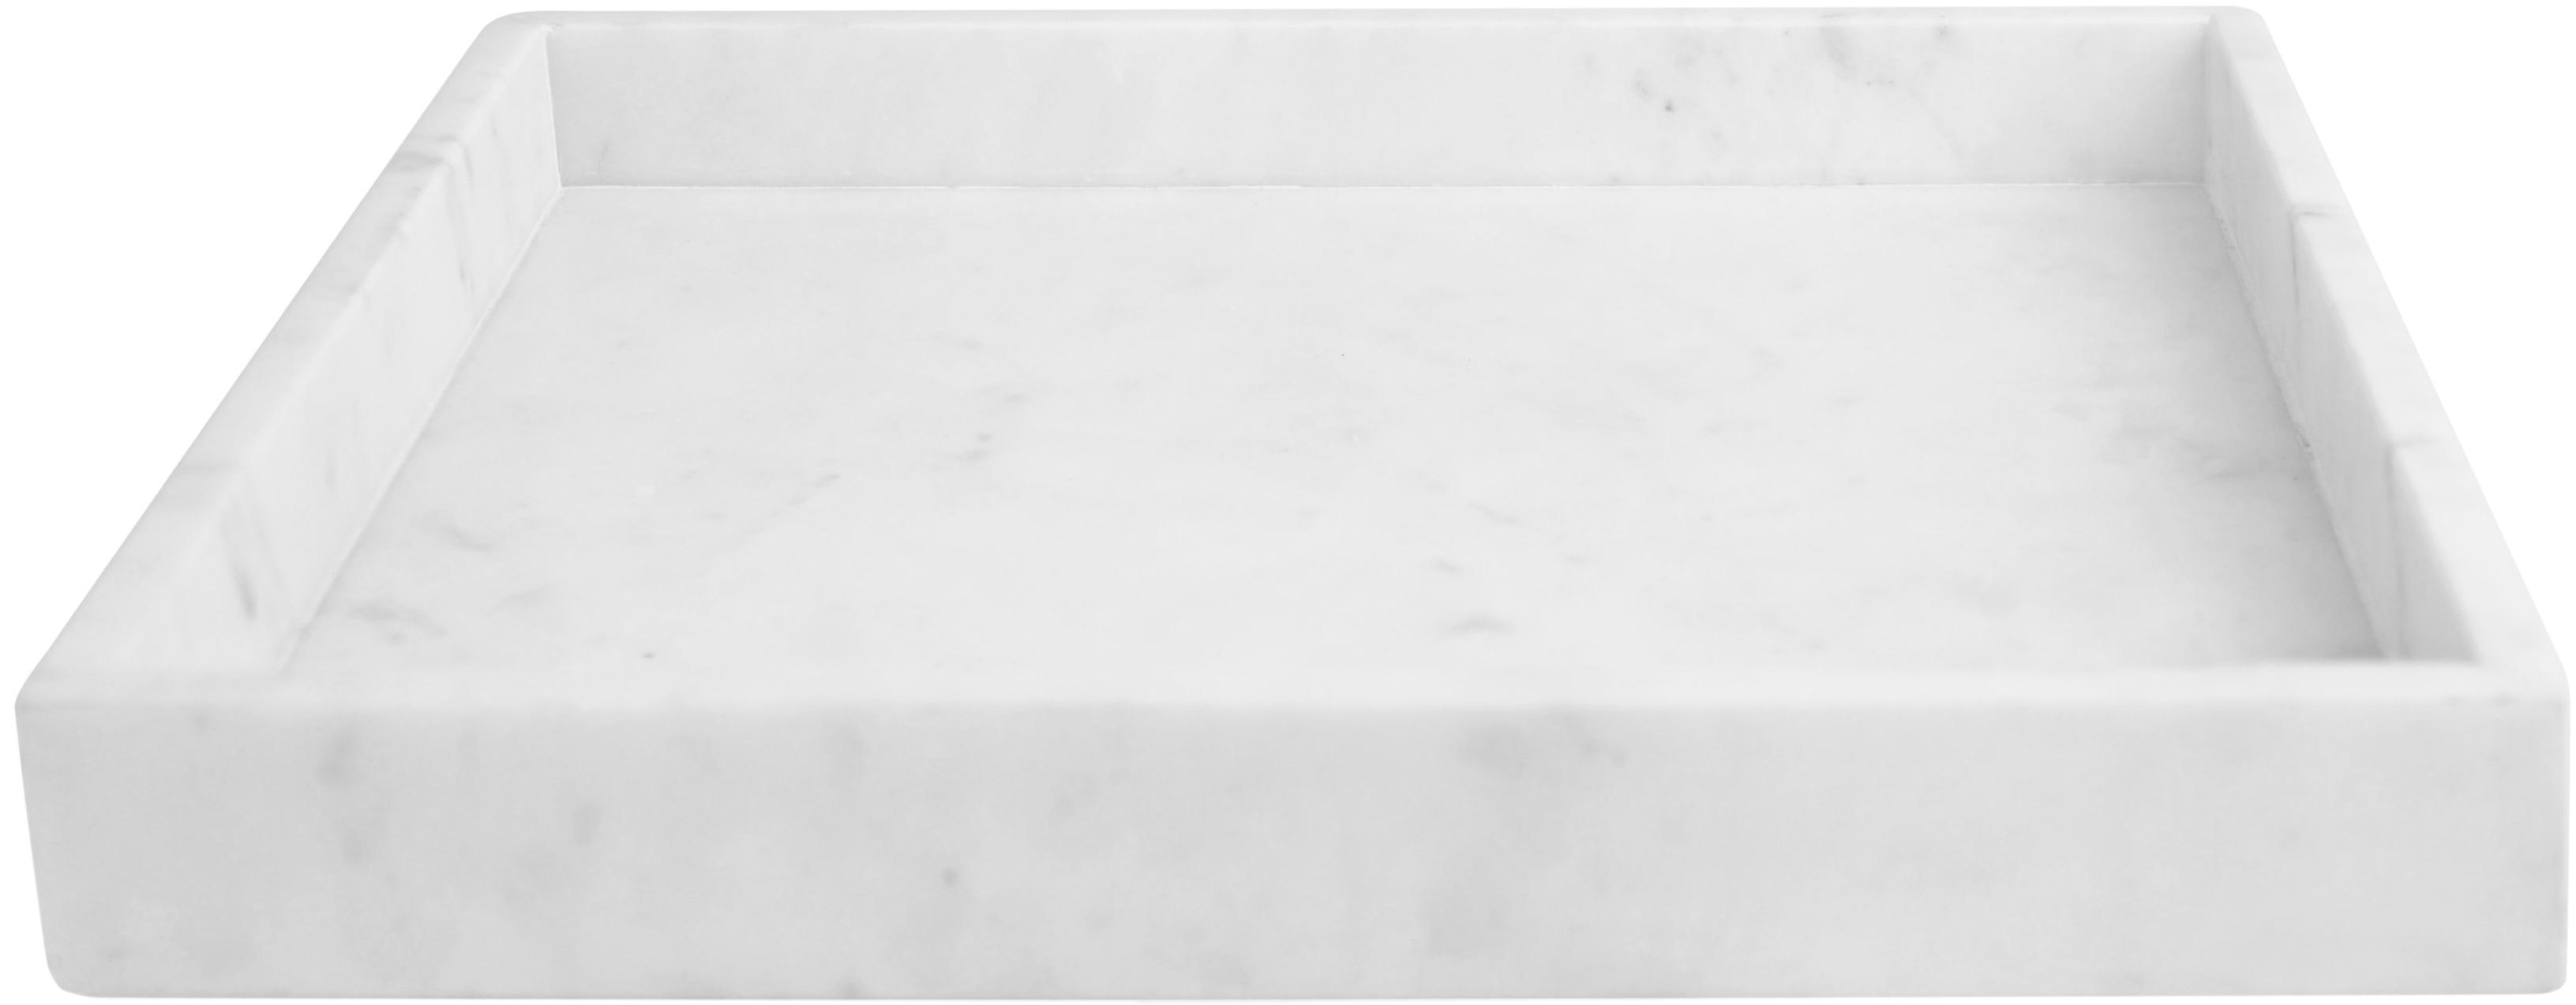 Deko-Marmor-Tablett Ciaran, Marmor, Weiss, marmoriert, B 30 x T 30 cm